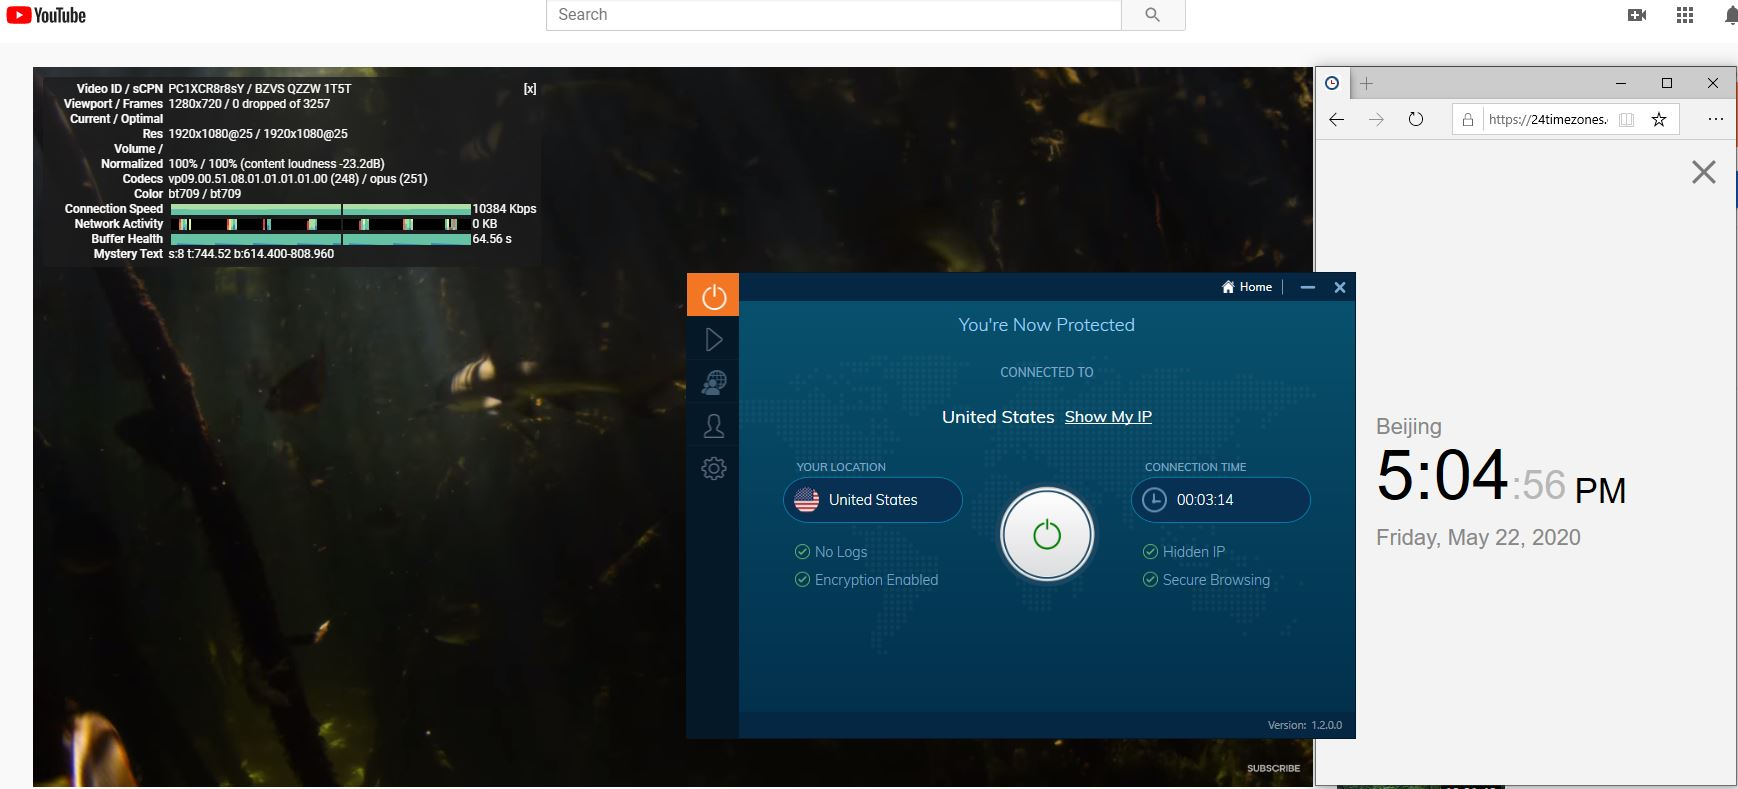 Windows10 IvacyVPN United States 中国VPN 翻墙 科学上网 youtube测速-20200522